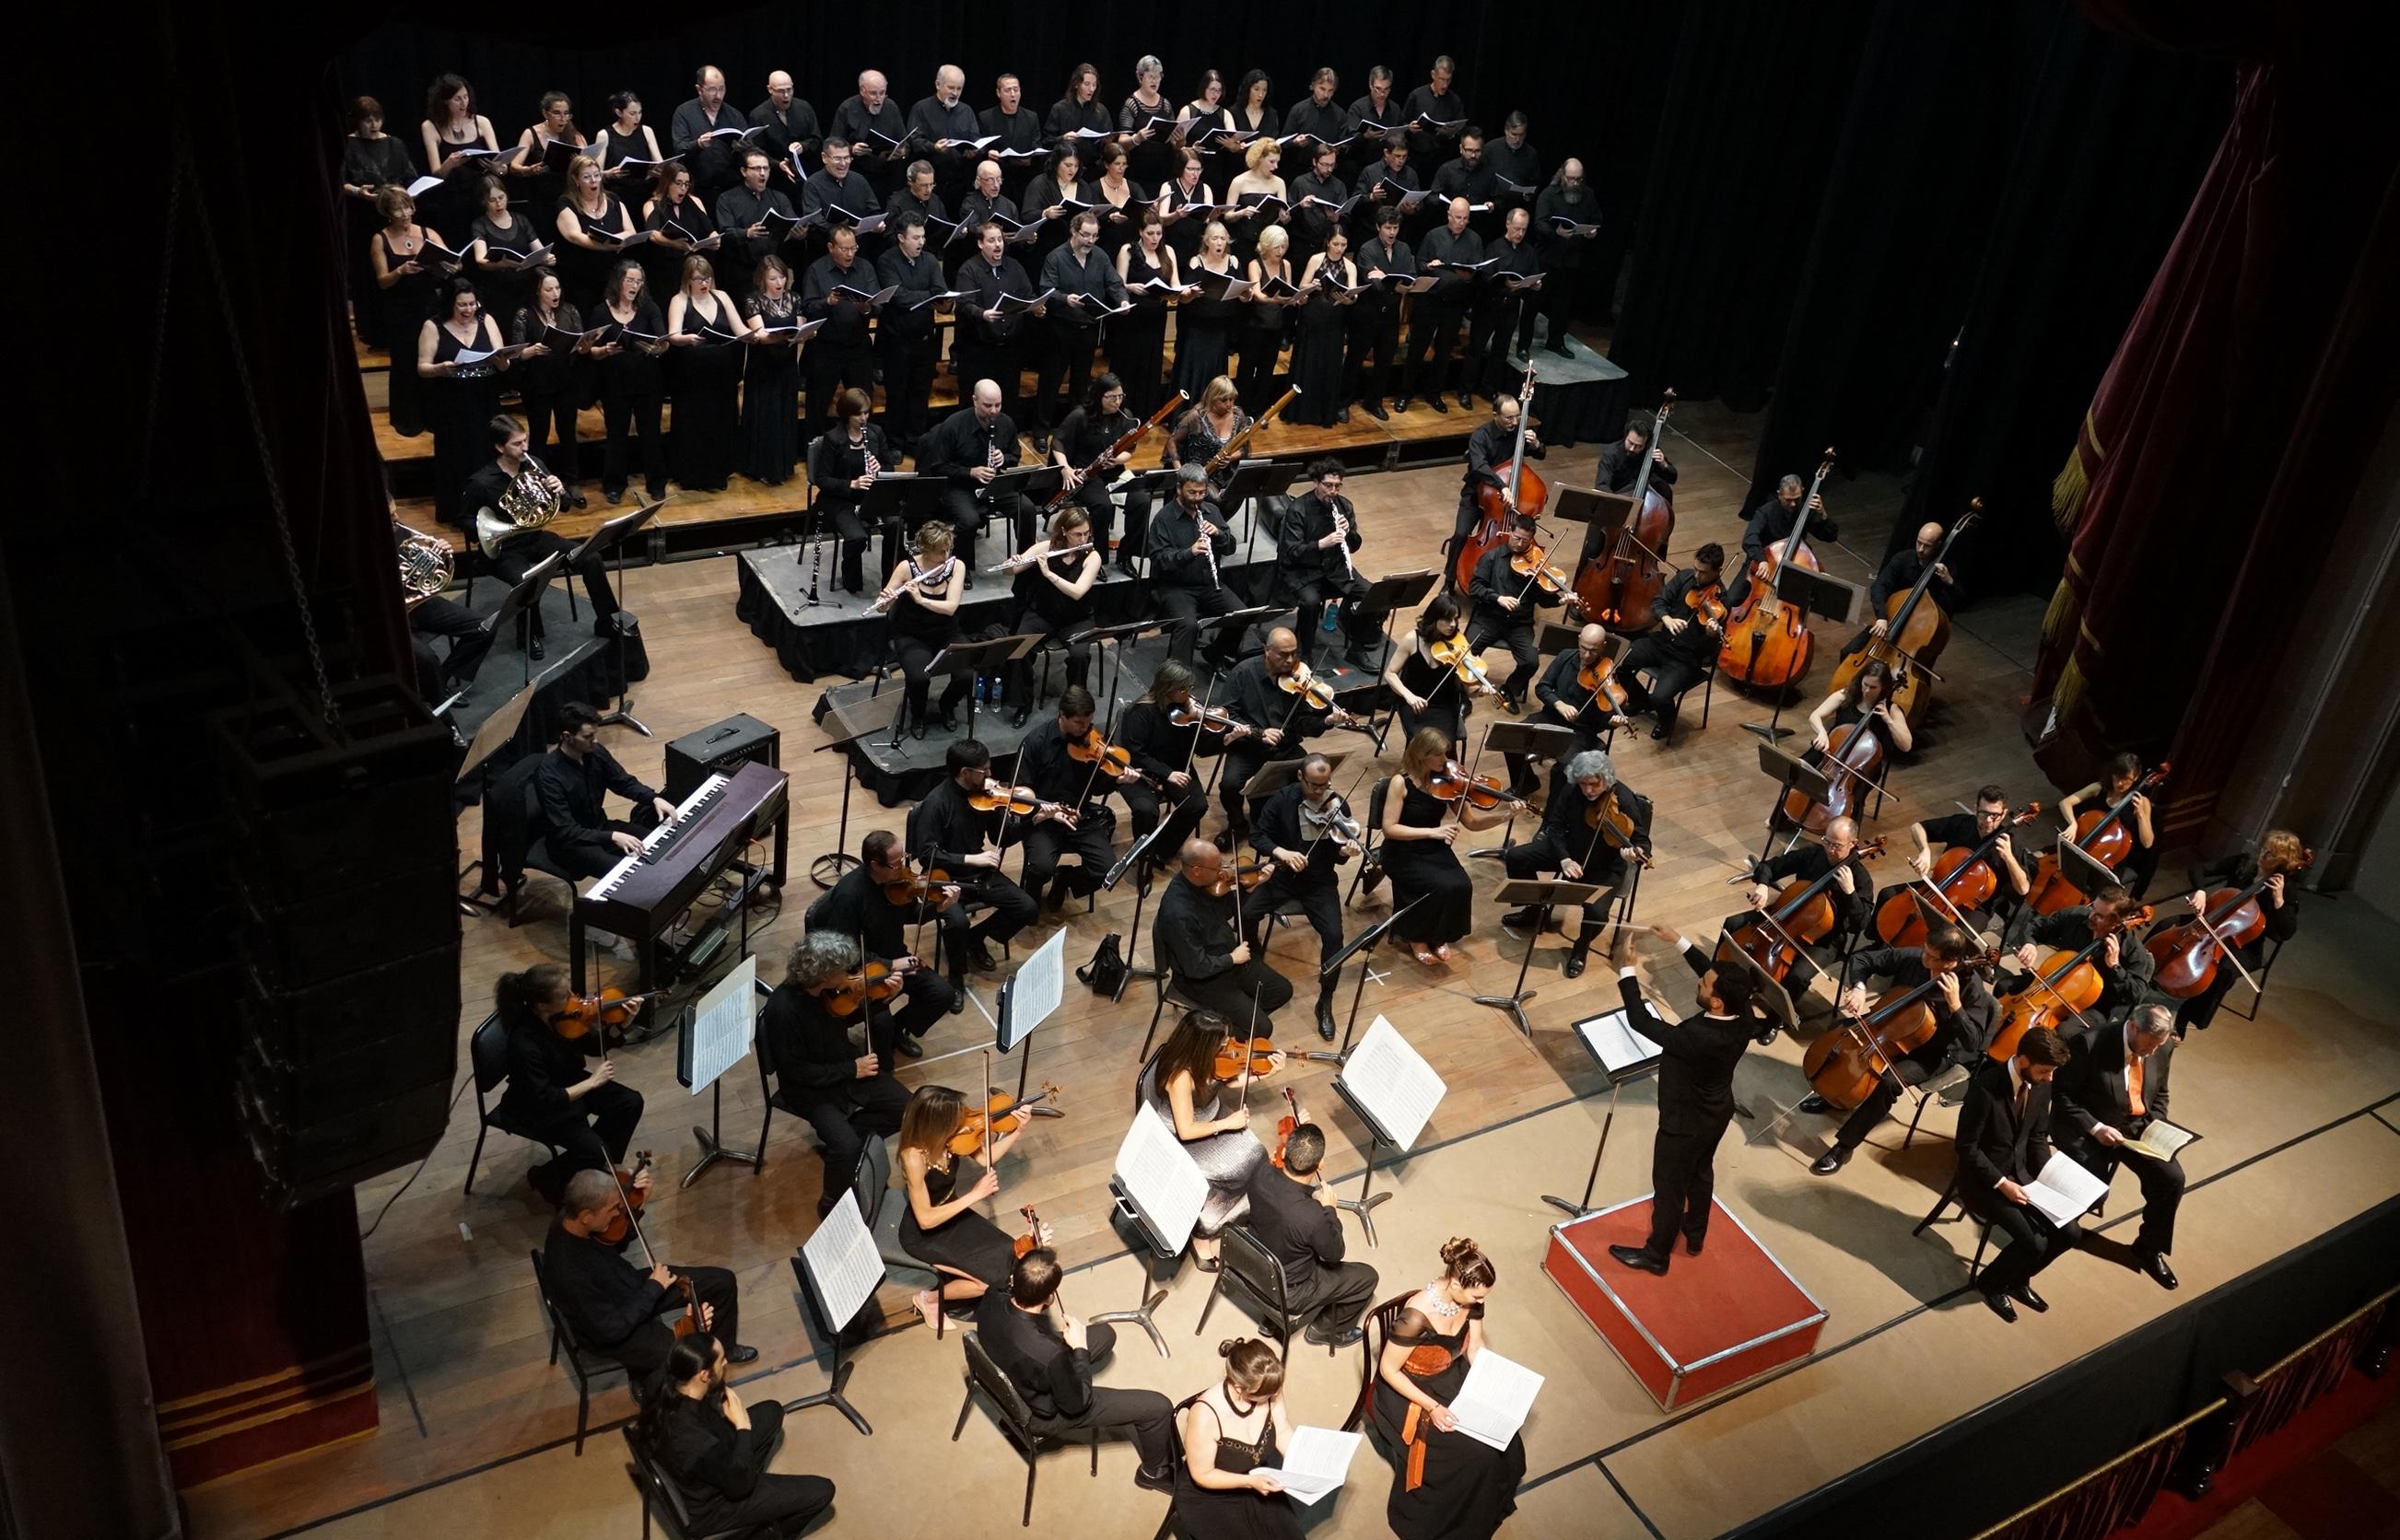 Beethoven Mass in C Major